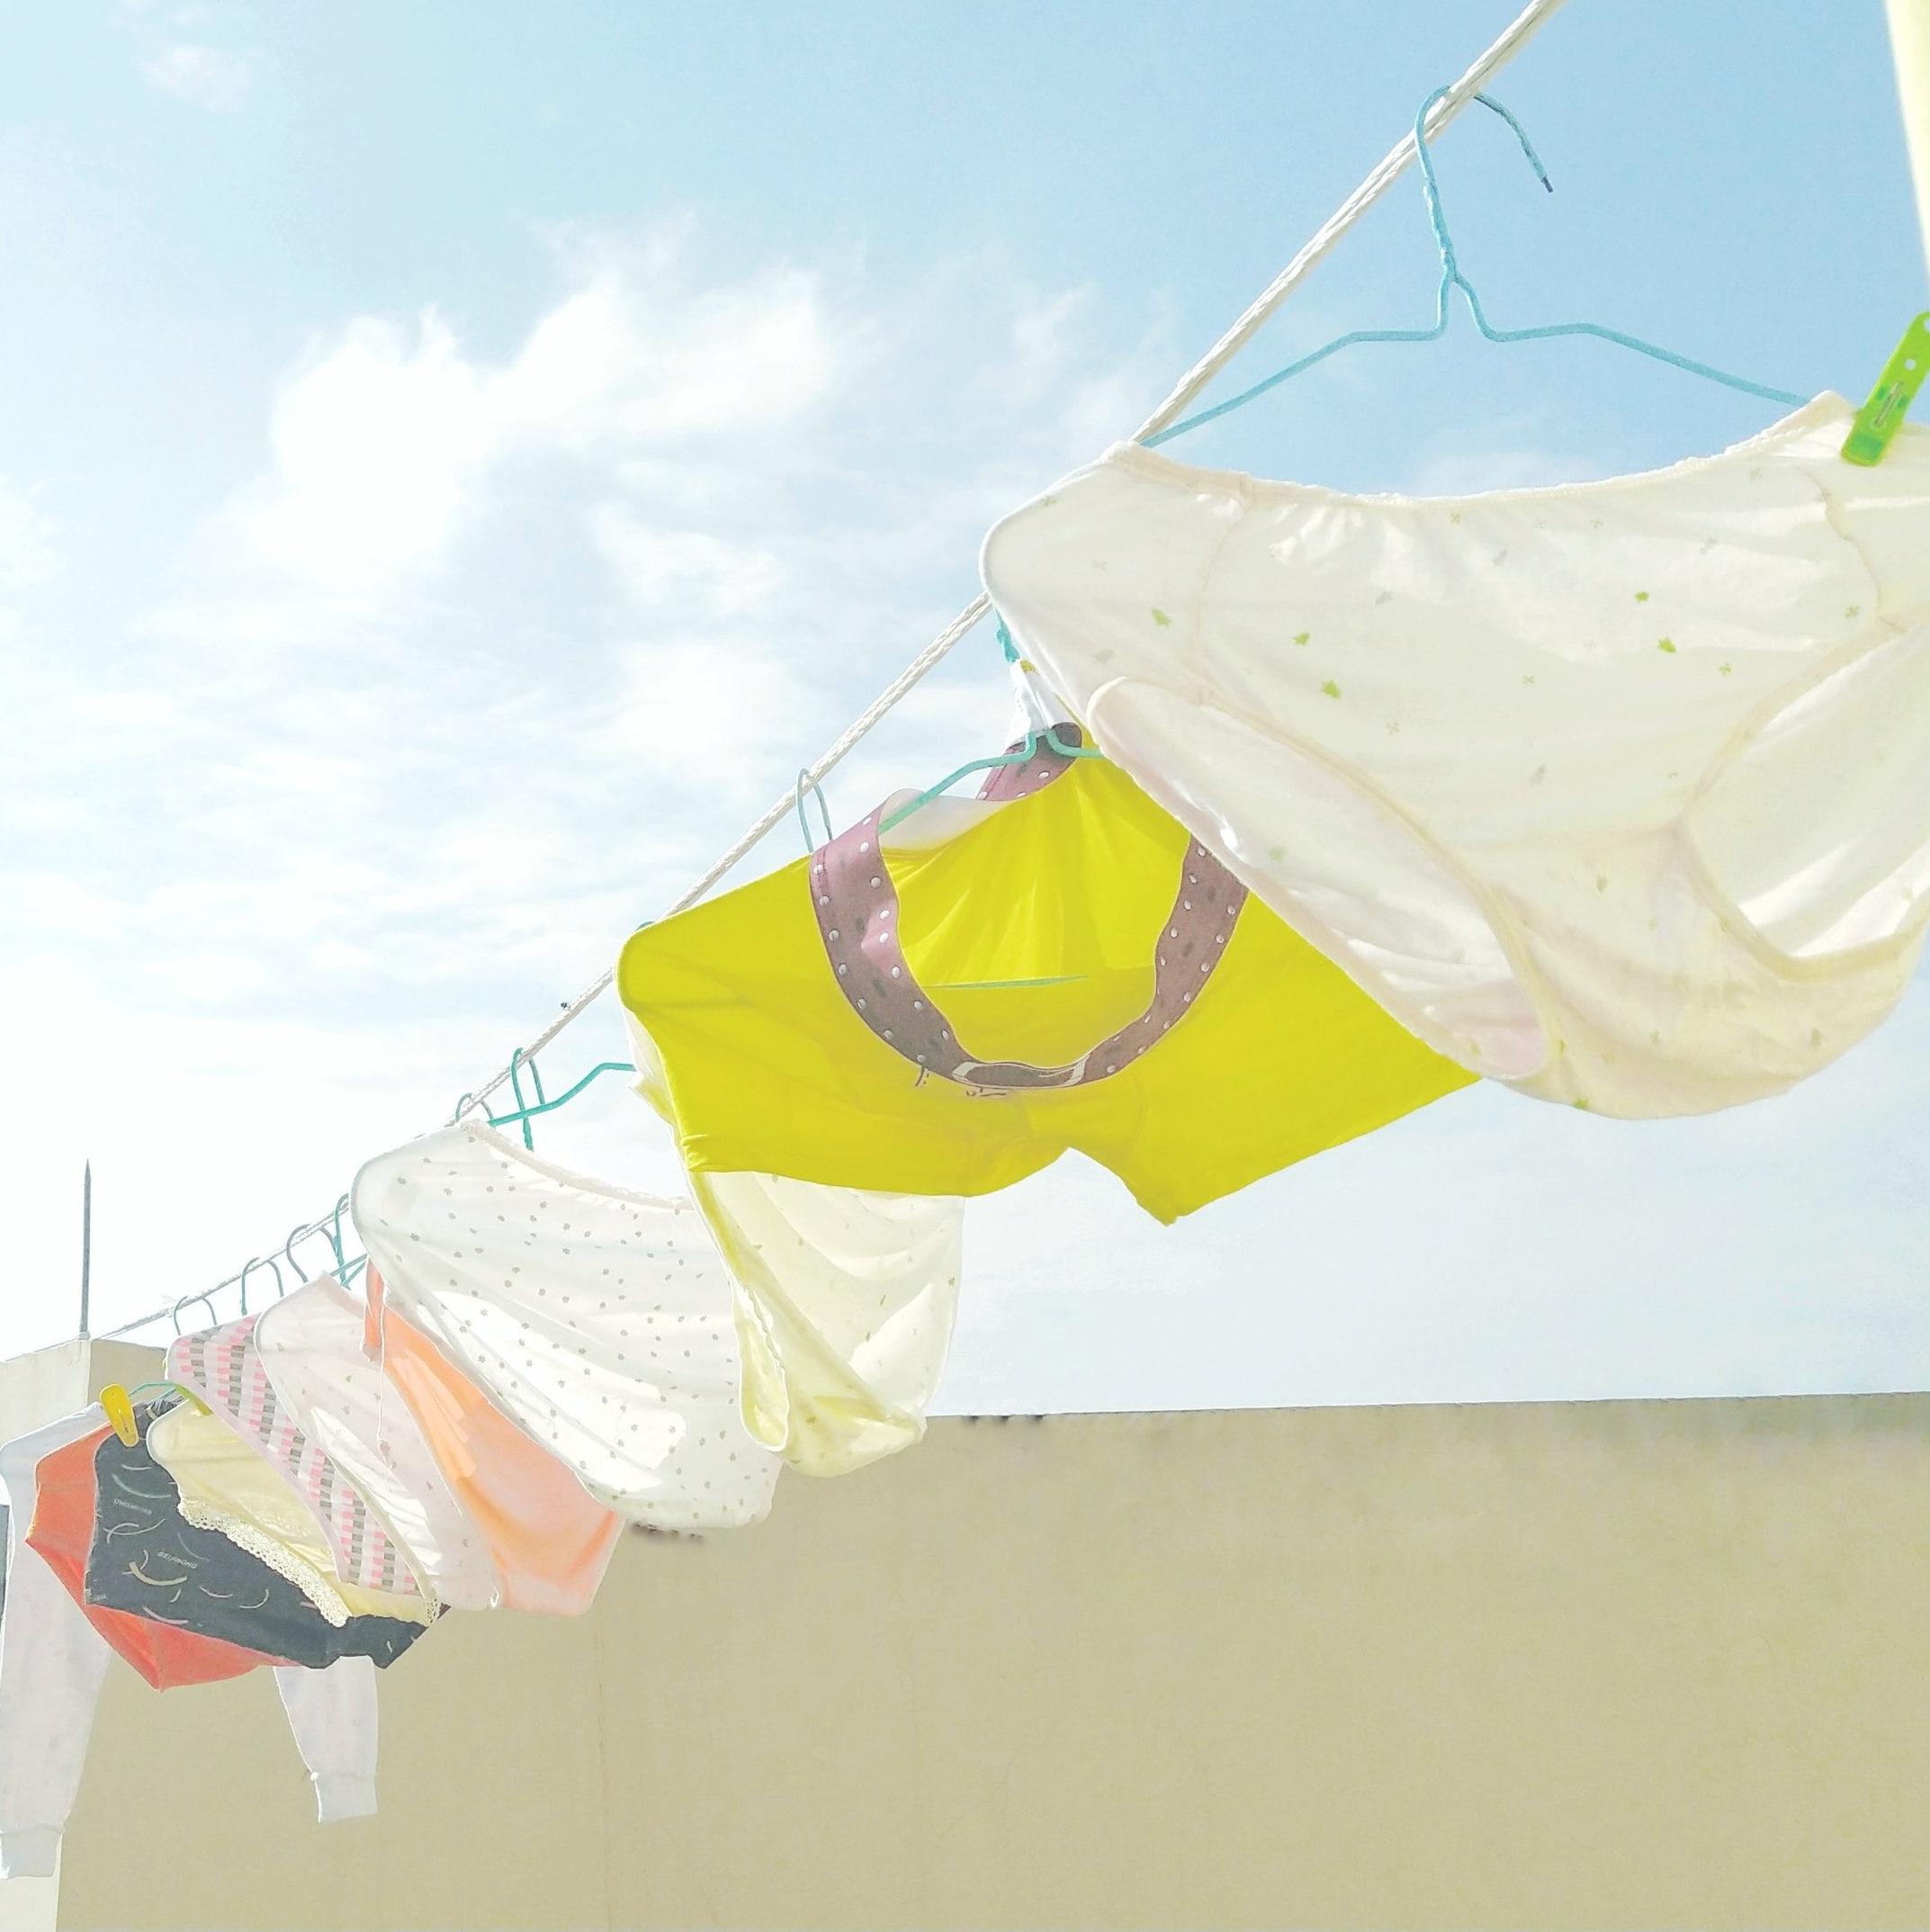 clothes-hanger-clothes-line-hanger-1597650.jpg